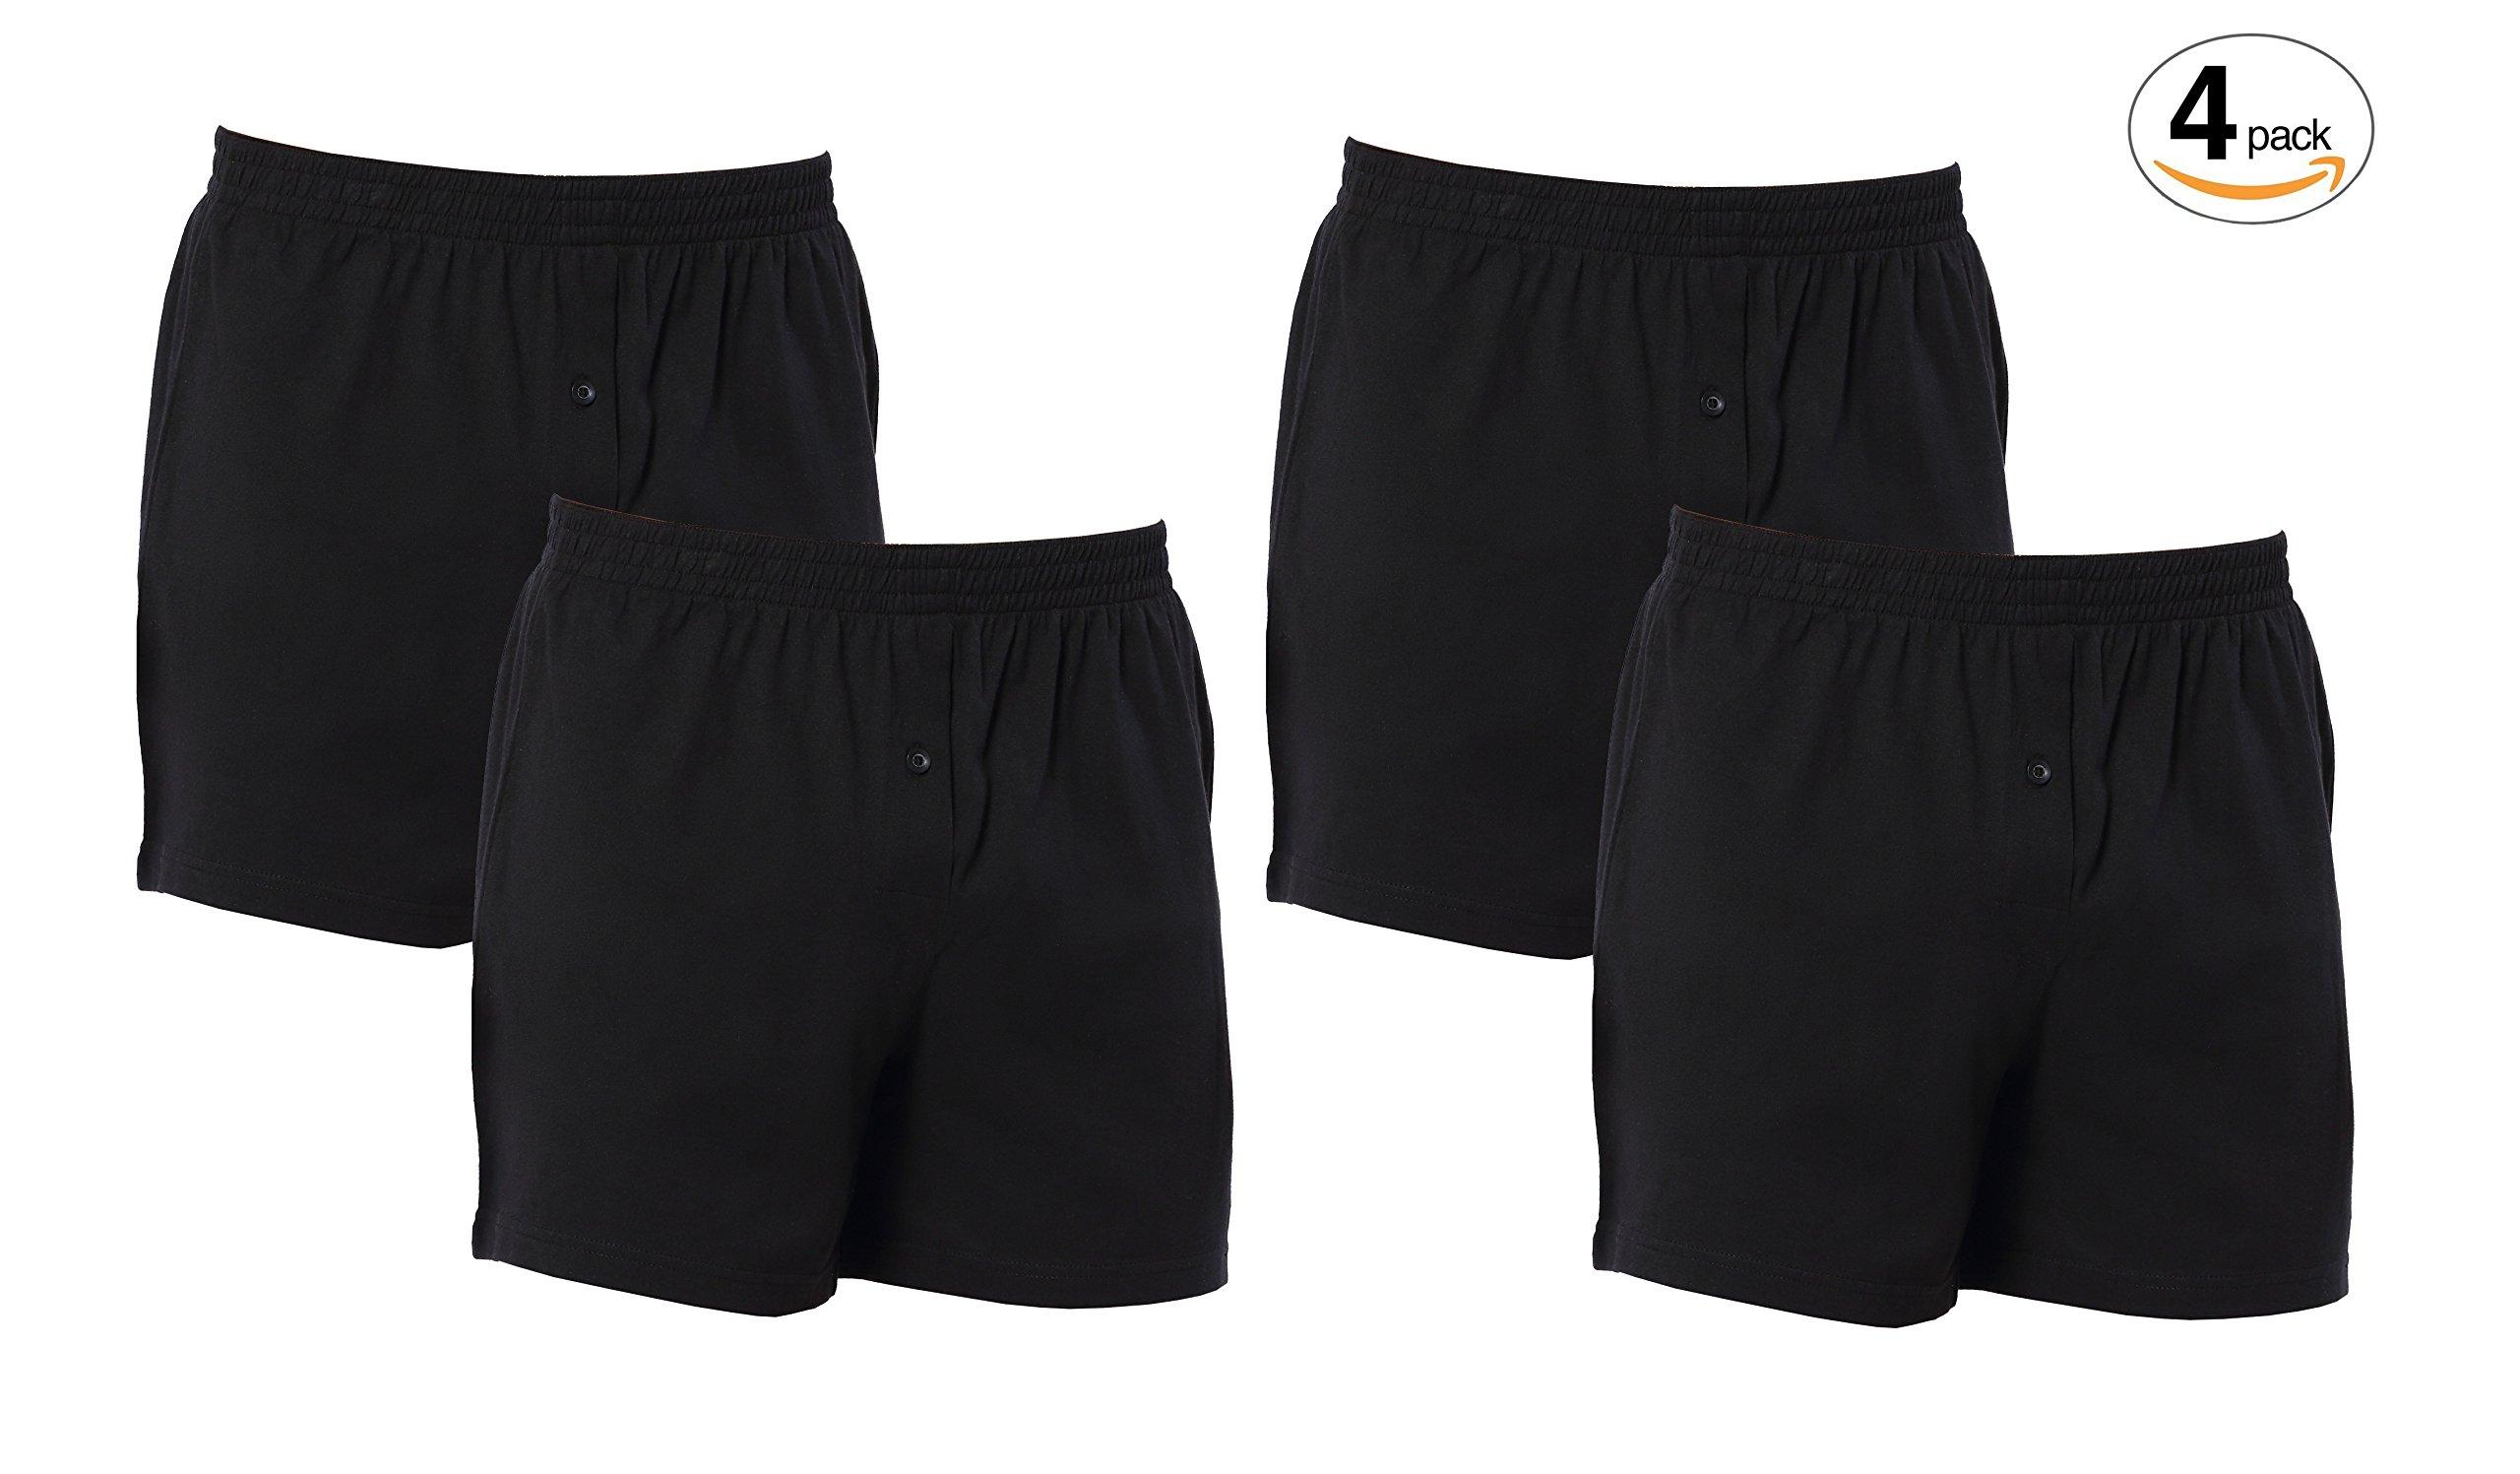 CYZ Mens 4-PK 100% Cotton Knit Pajama Bottoms - Sleep/Lounge Shorts-Black4PK-L